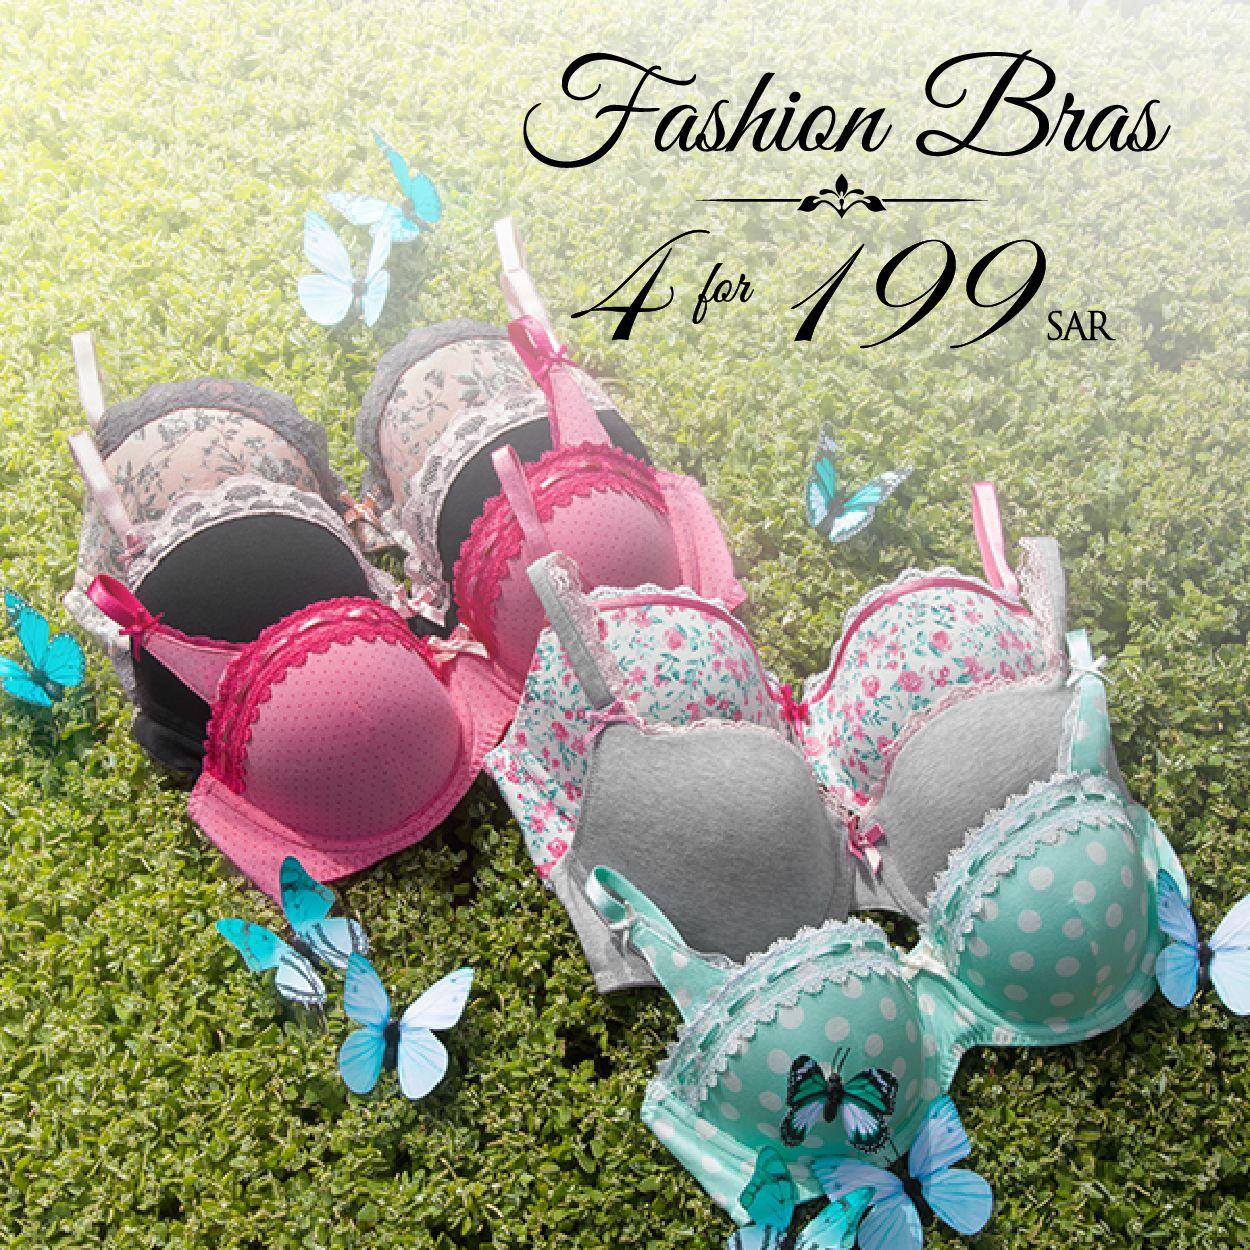 Fashion Bras Buy More And Save Bra Styles Bra Buy Bra